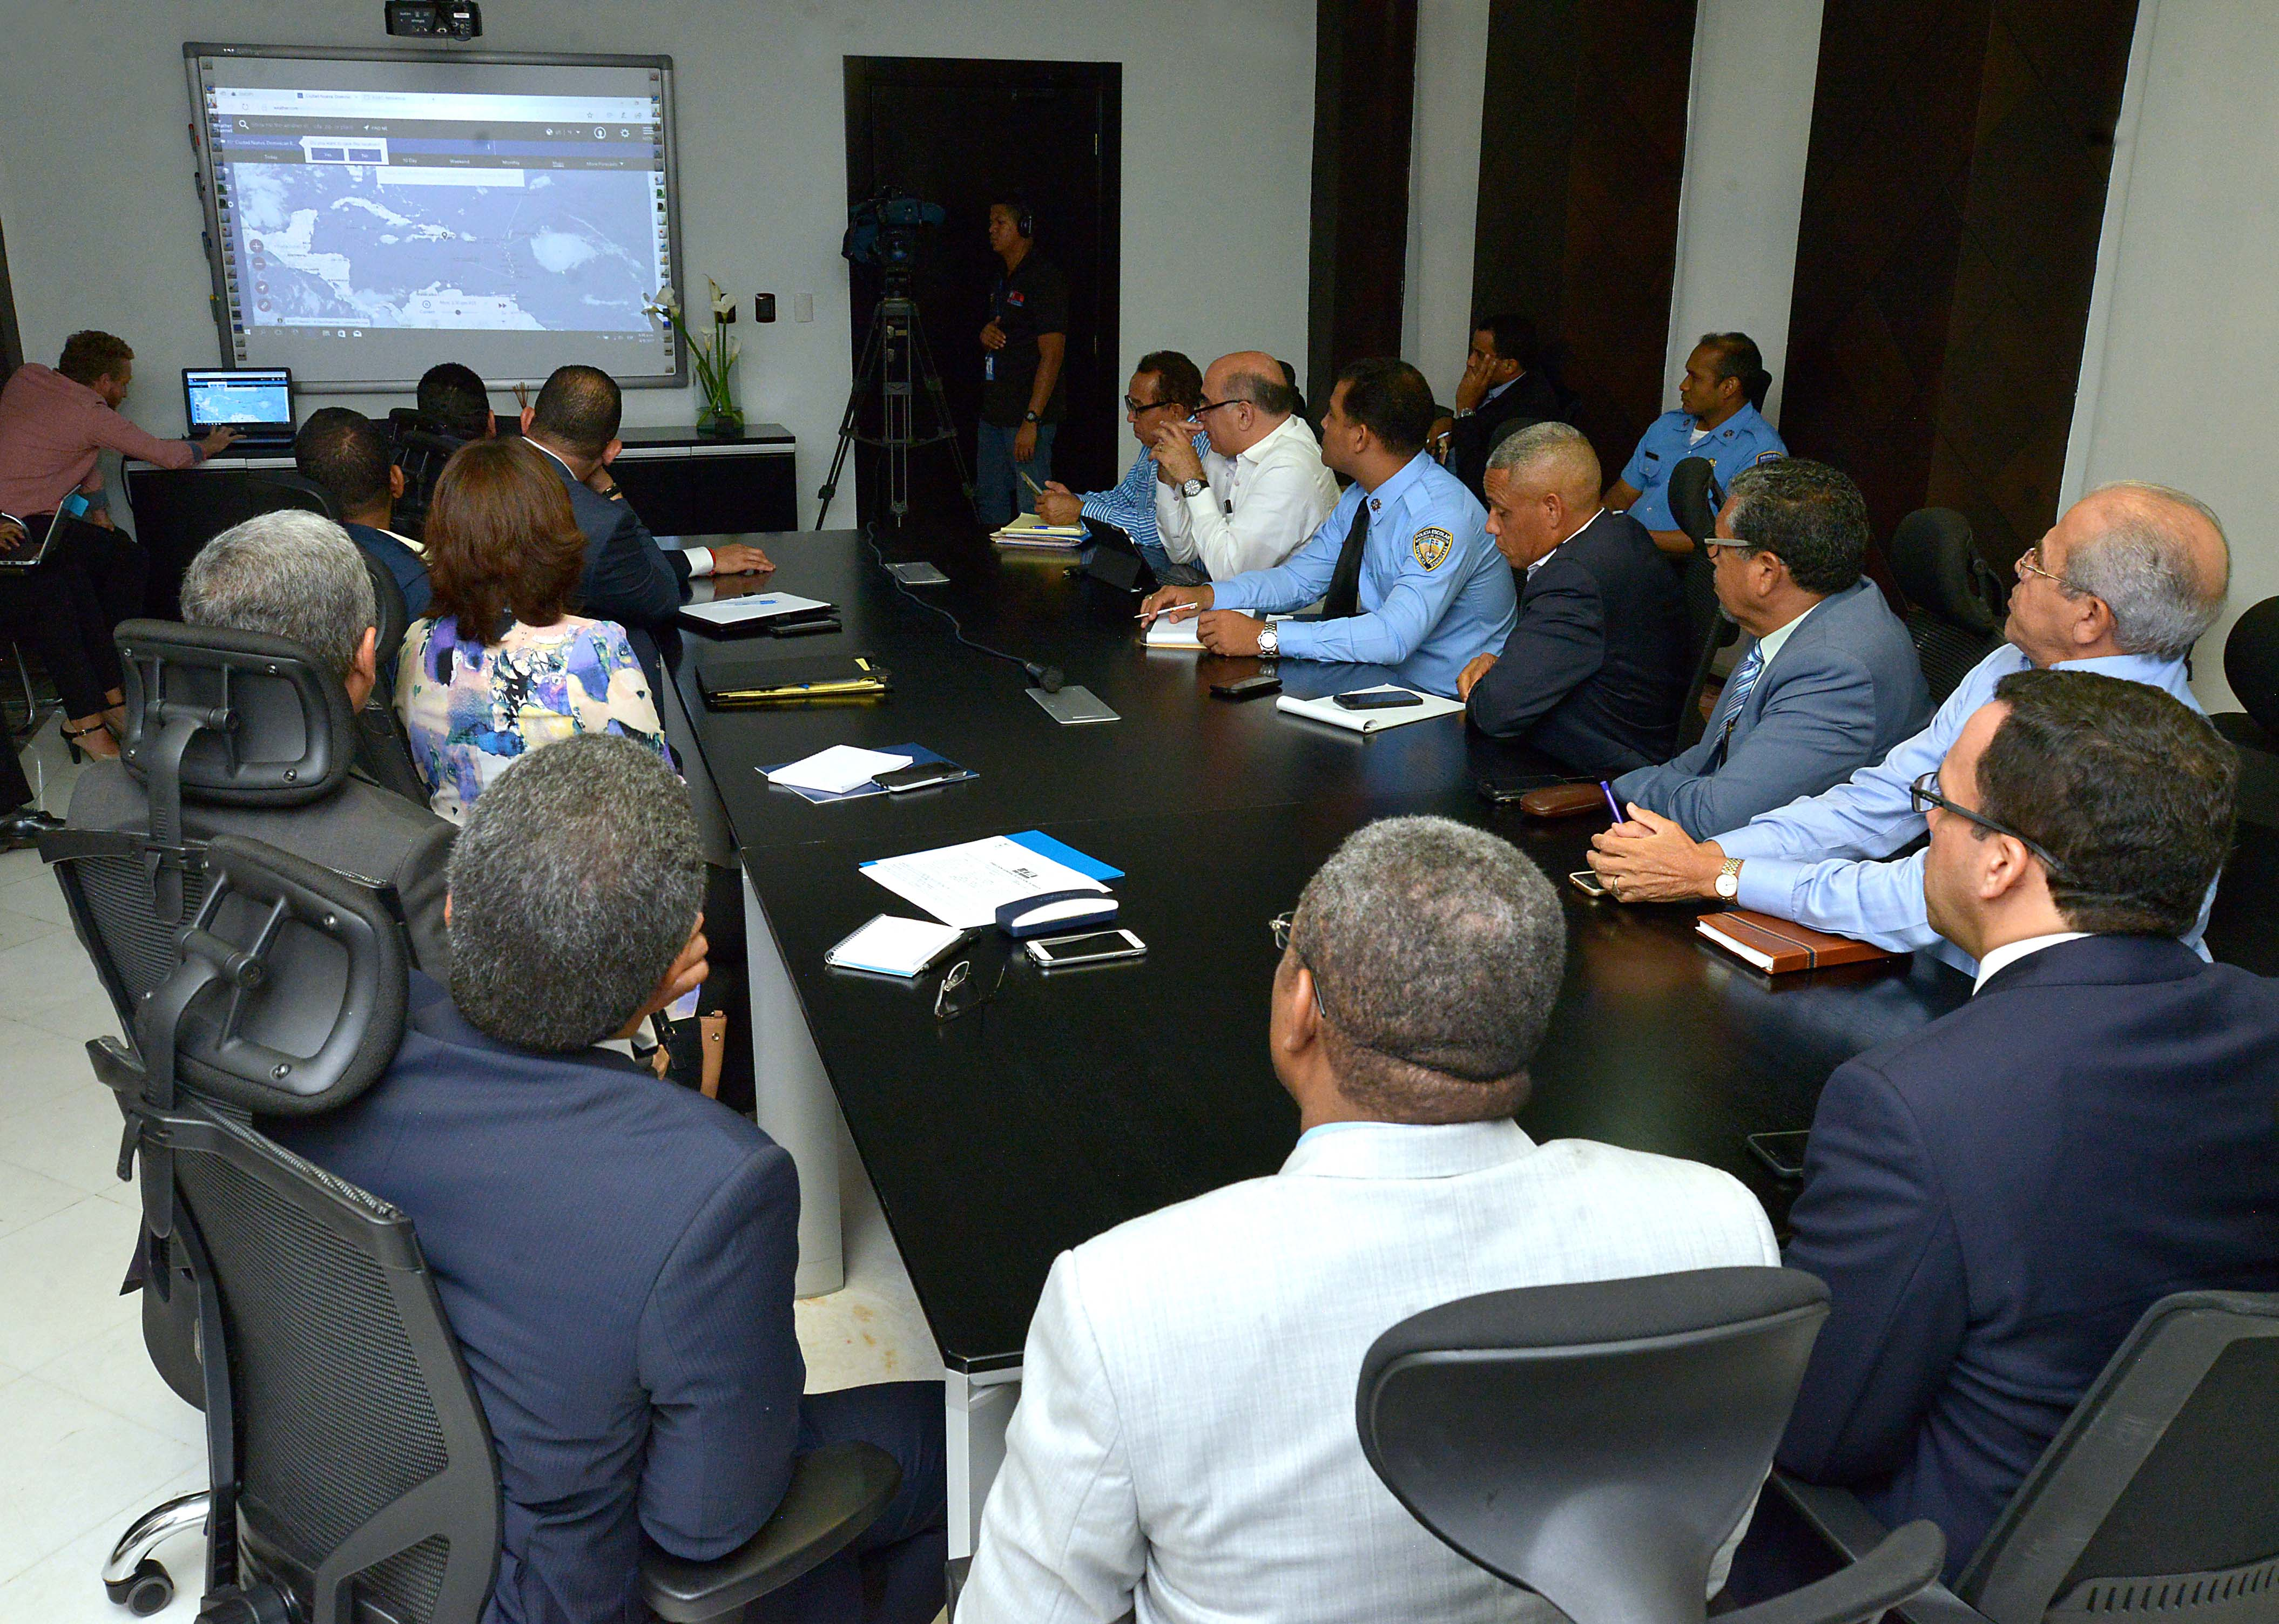 Ministerio de Educación activa plan de contingencia escolar ante amenaza del huracán Irma